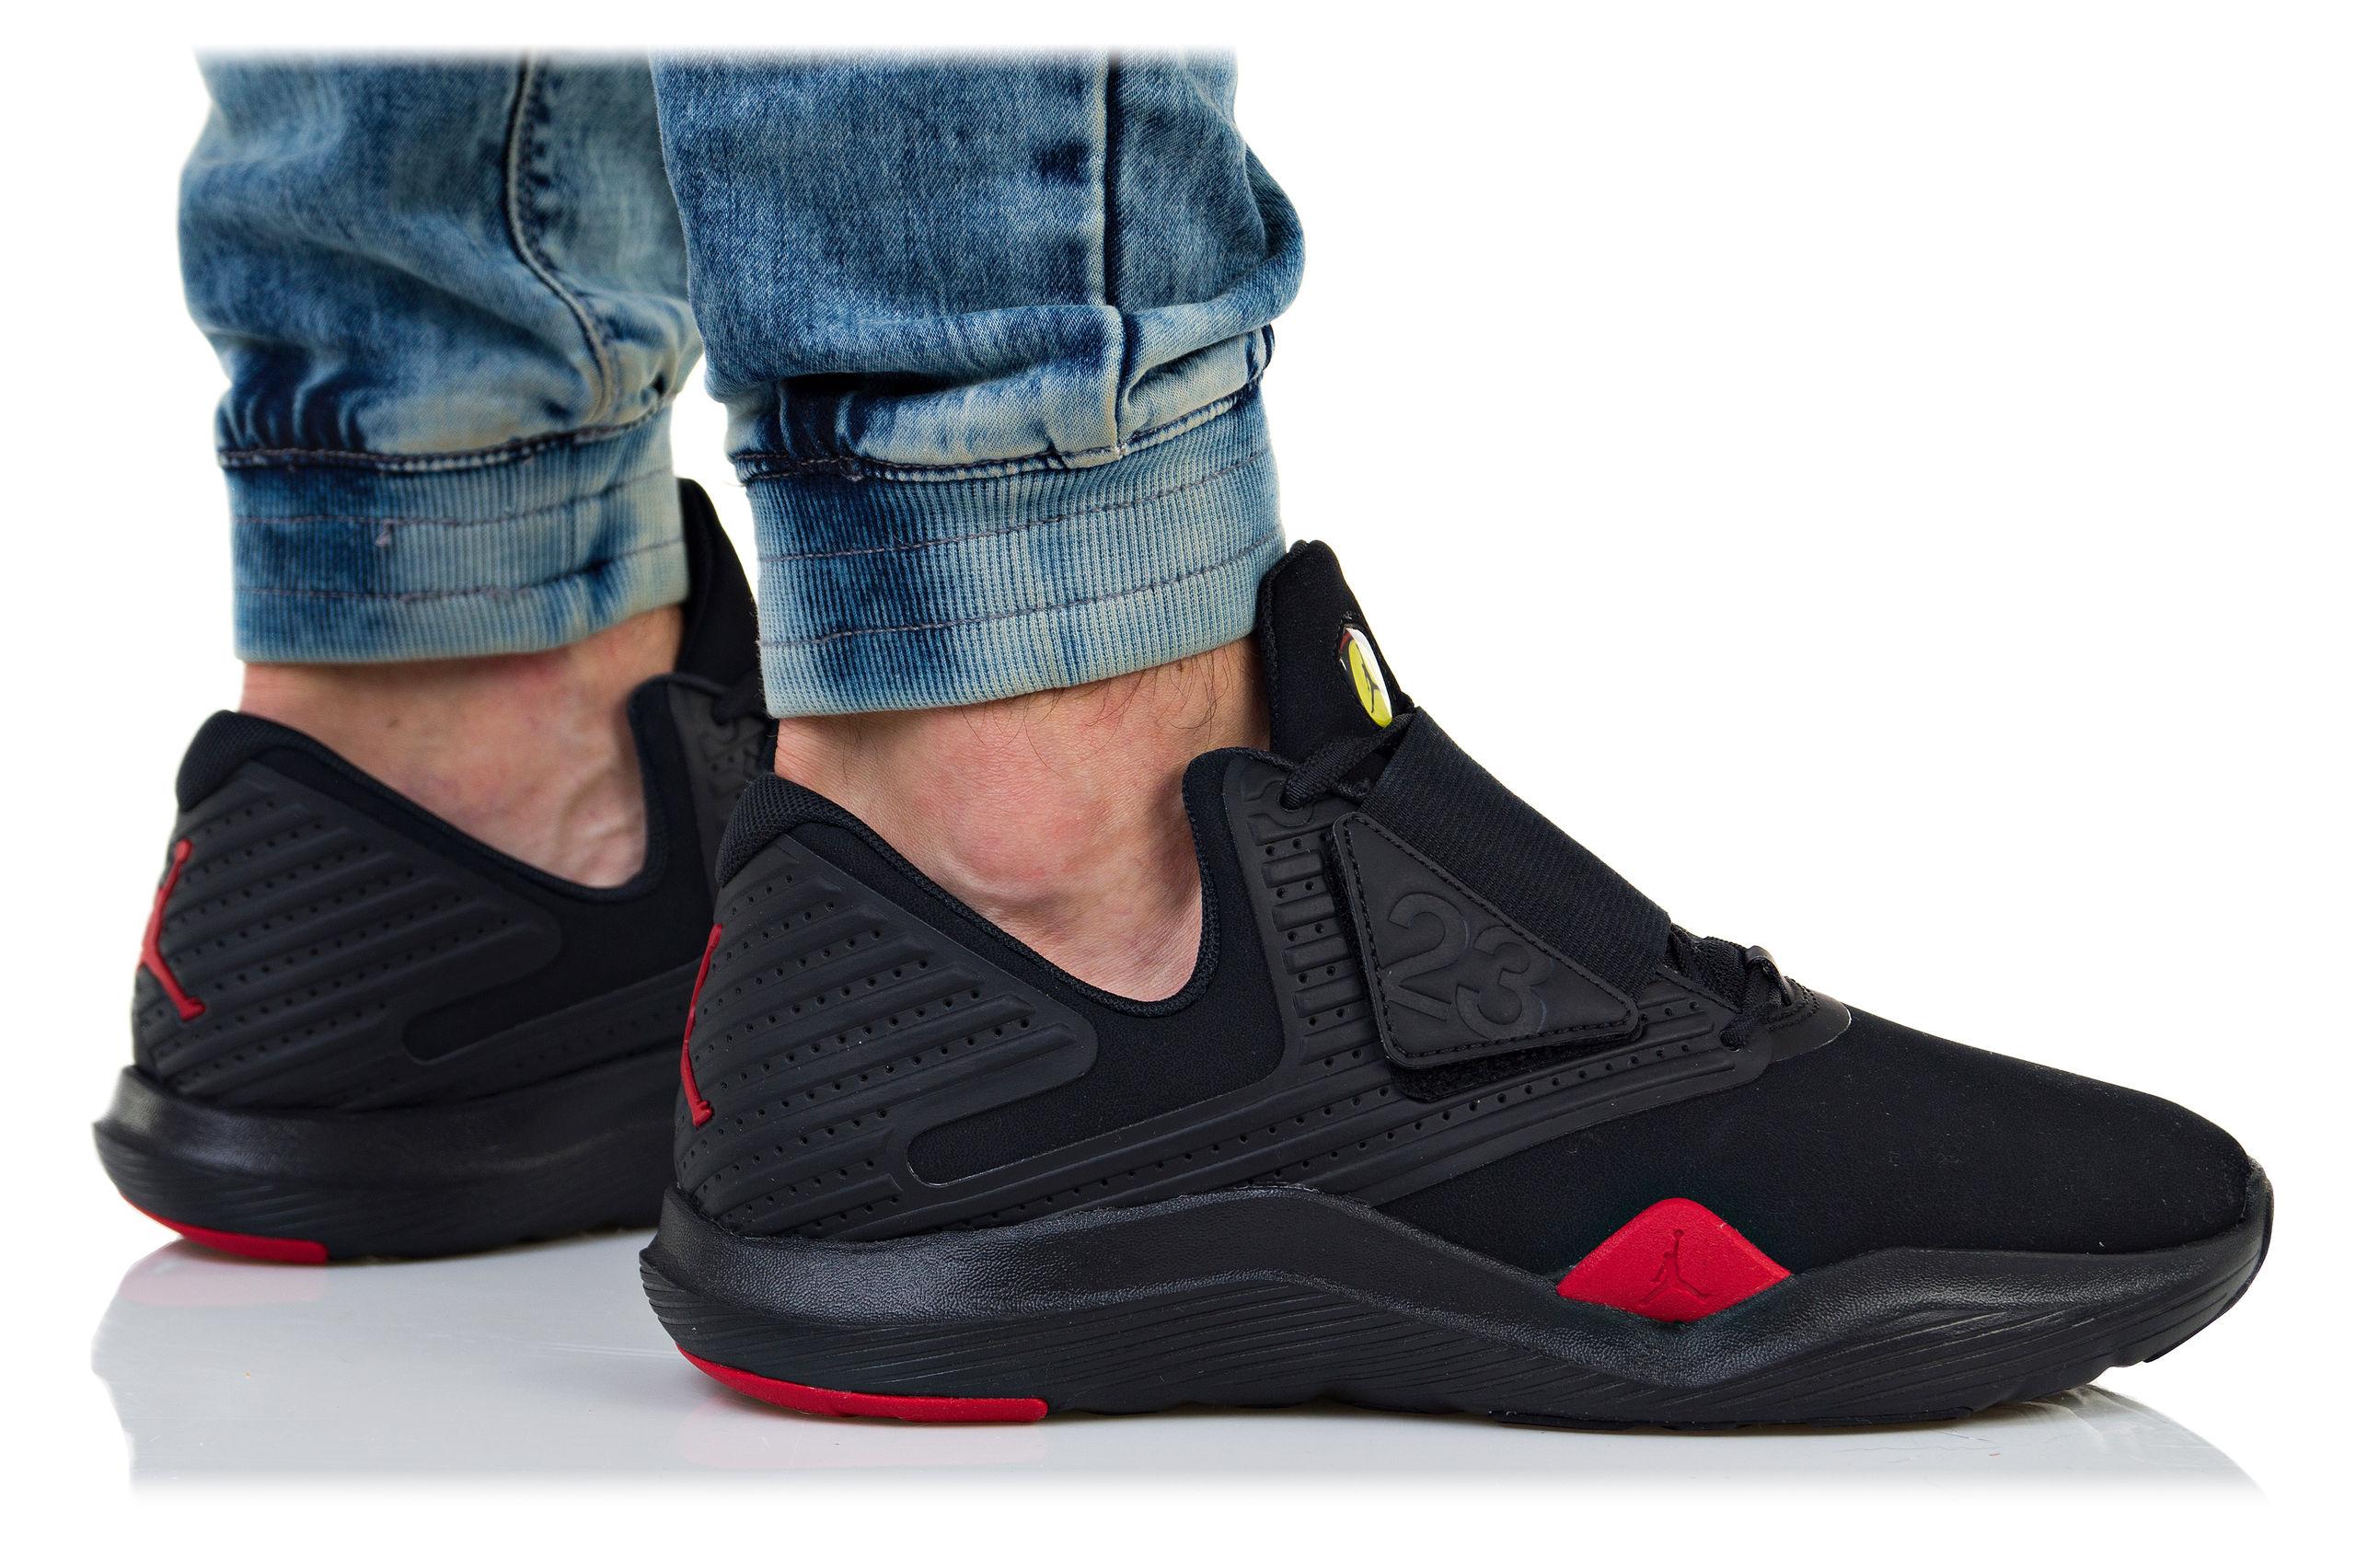 Nike Jordan Relentless AJ7990 003